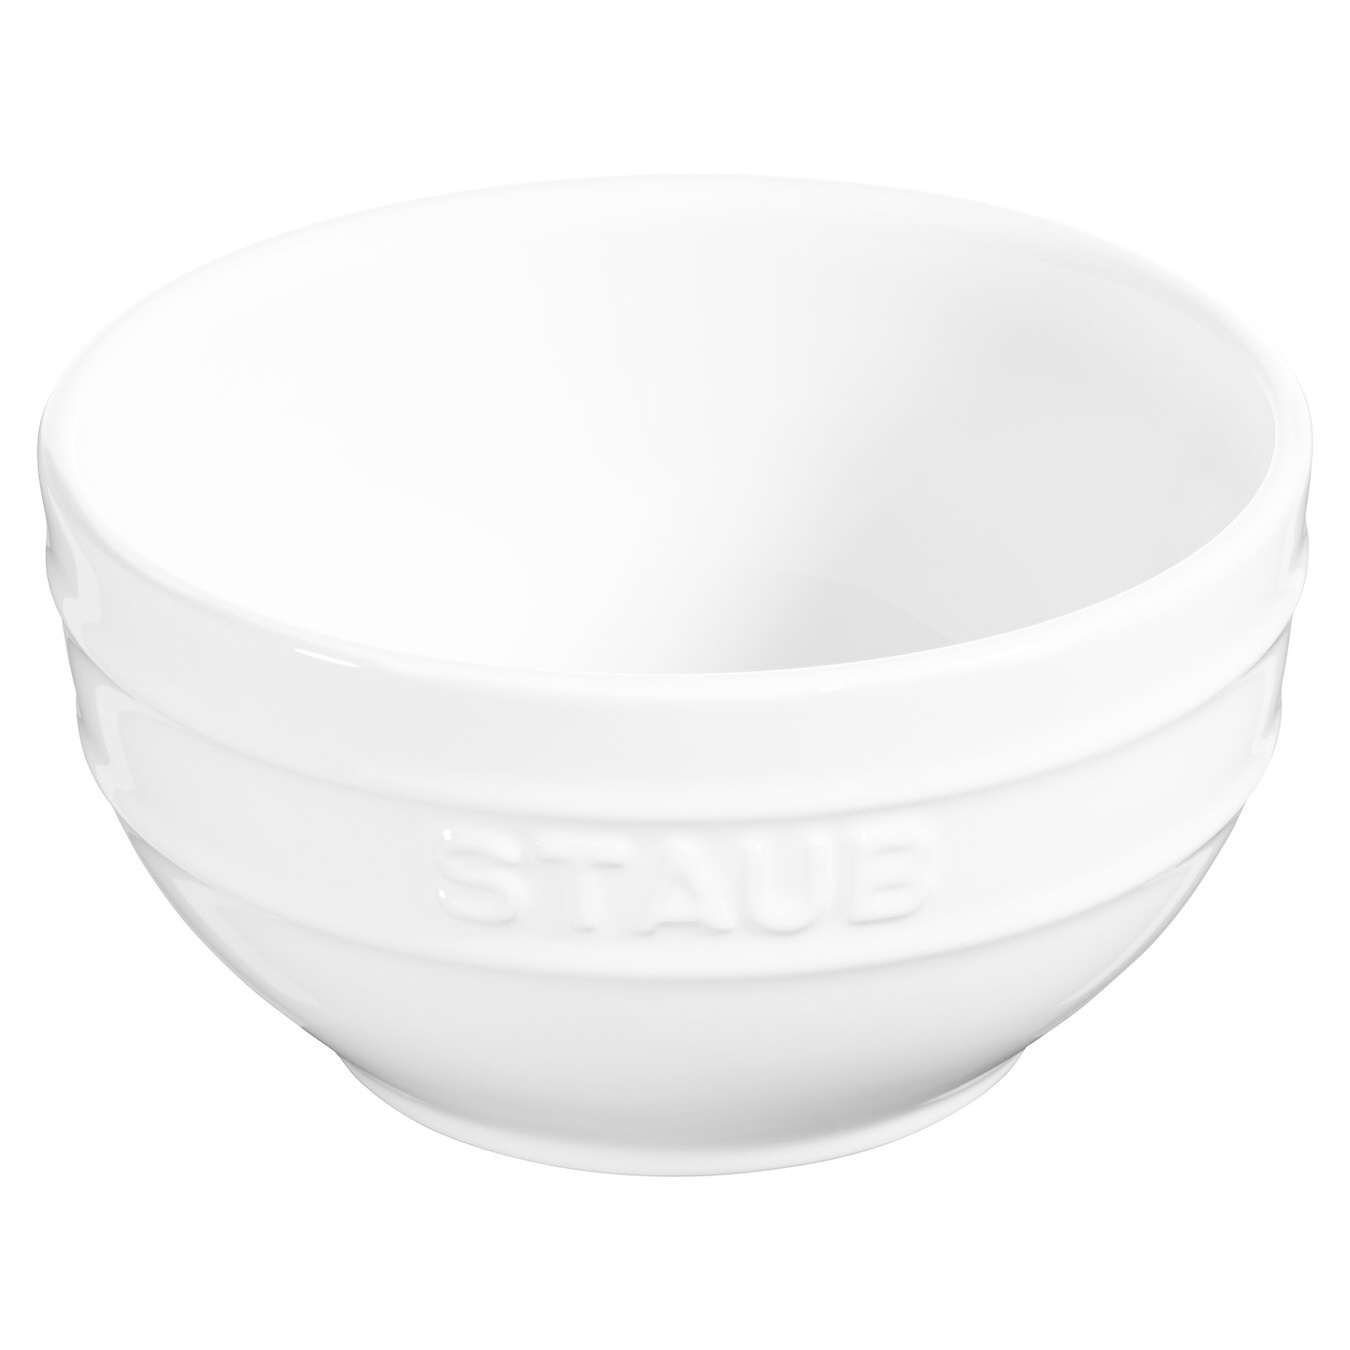 "Staub Bowl Medium White 14cm/5.5"" /14cm 0.7L/0.74qt"